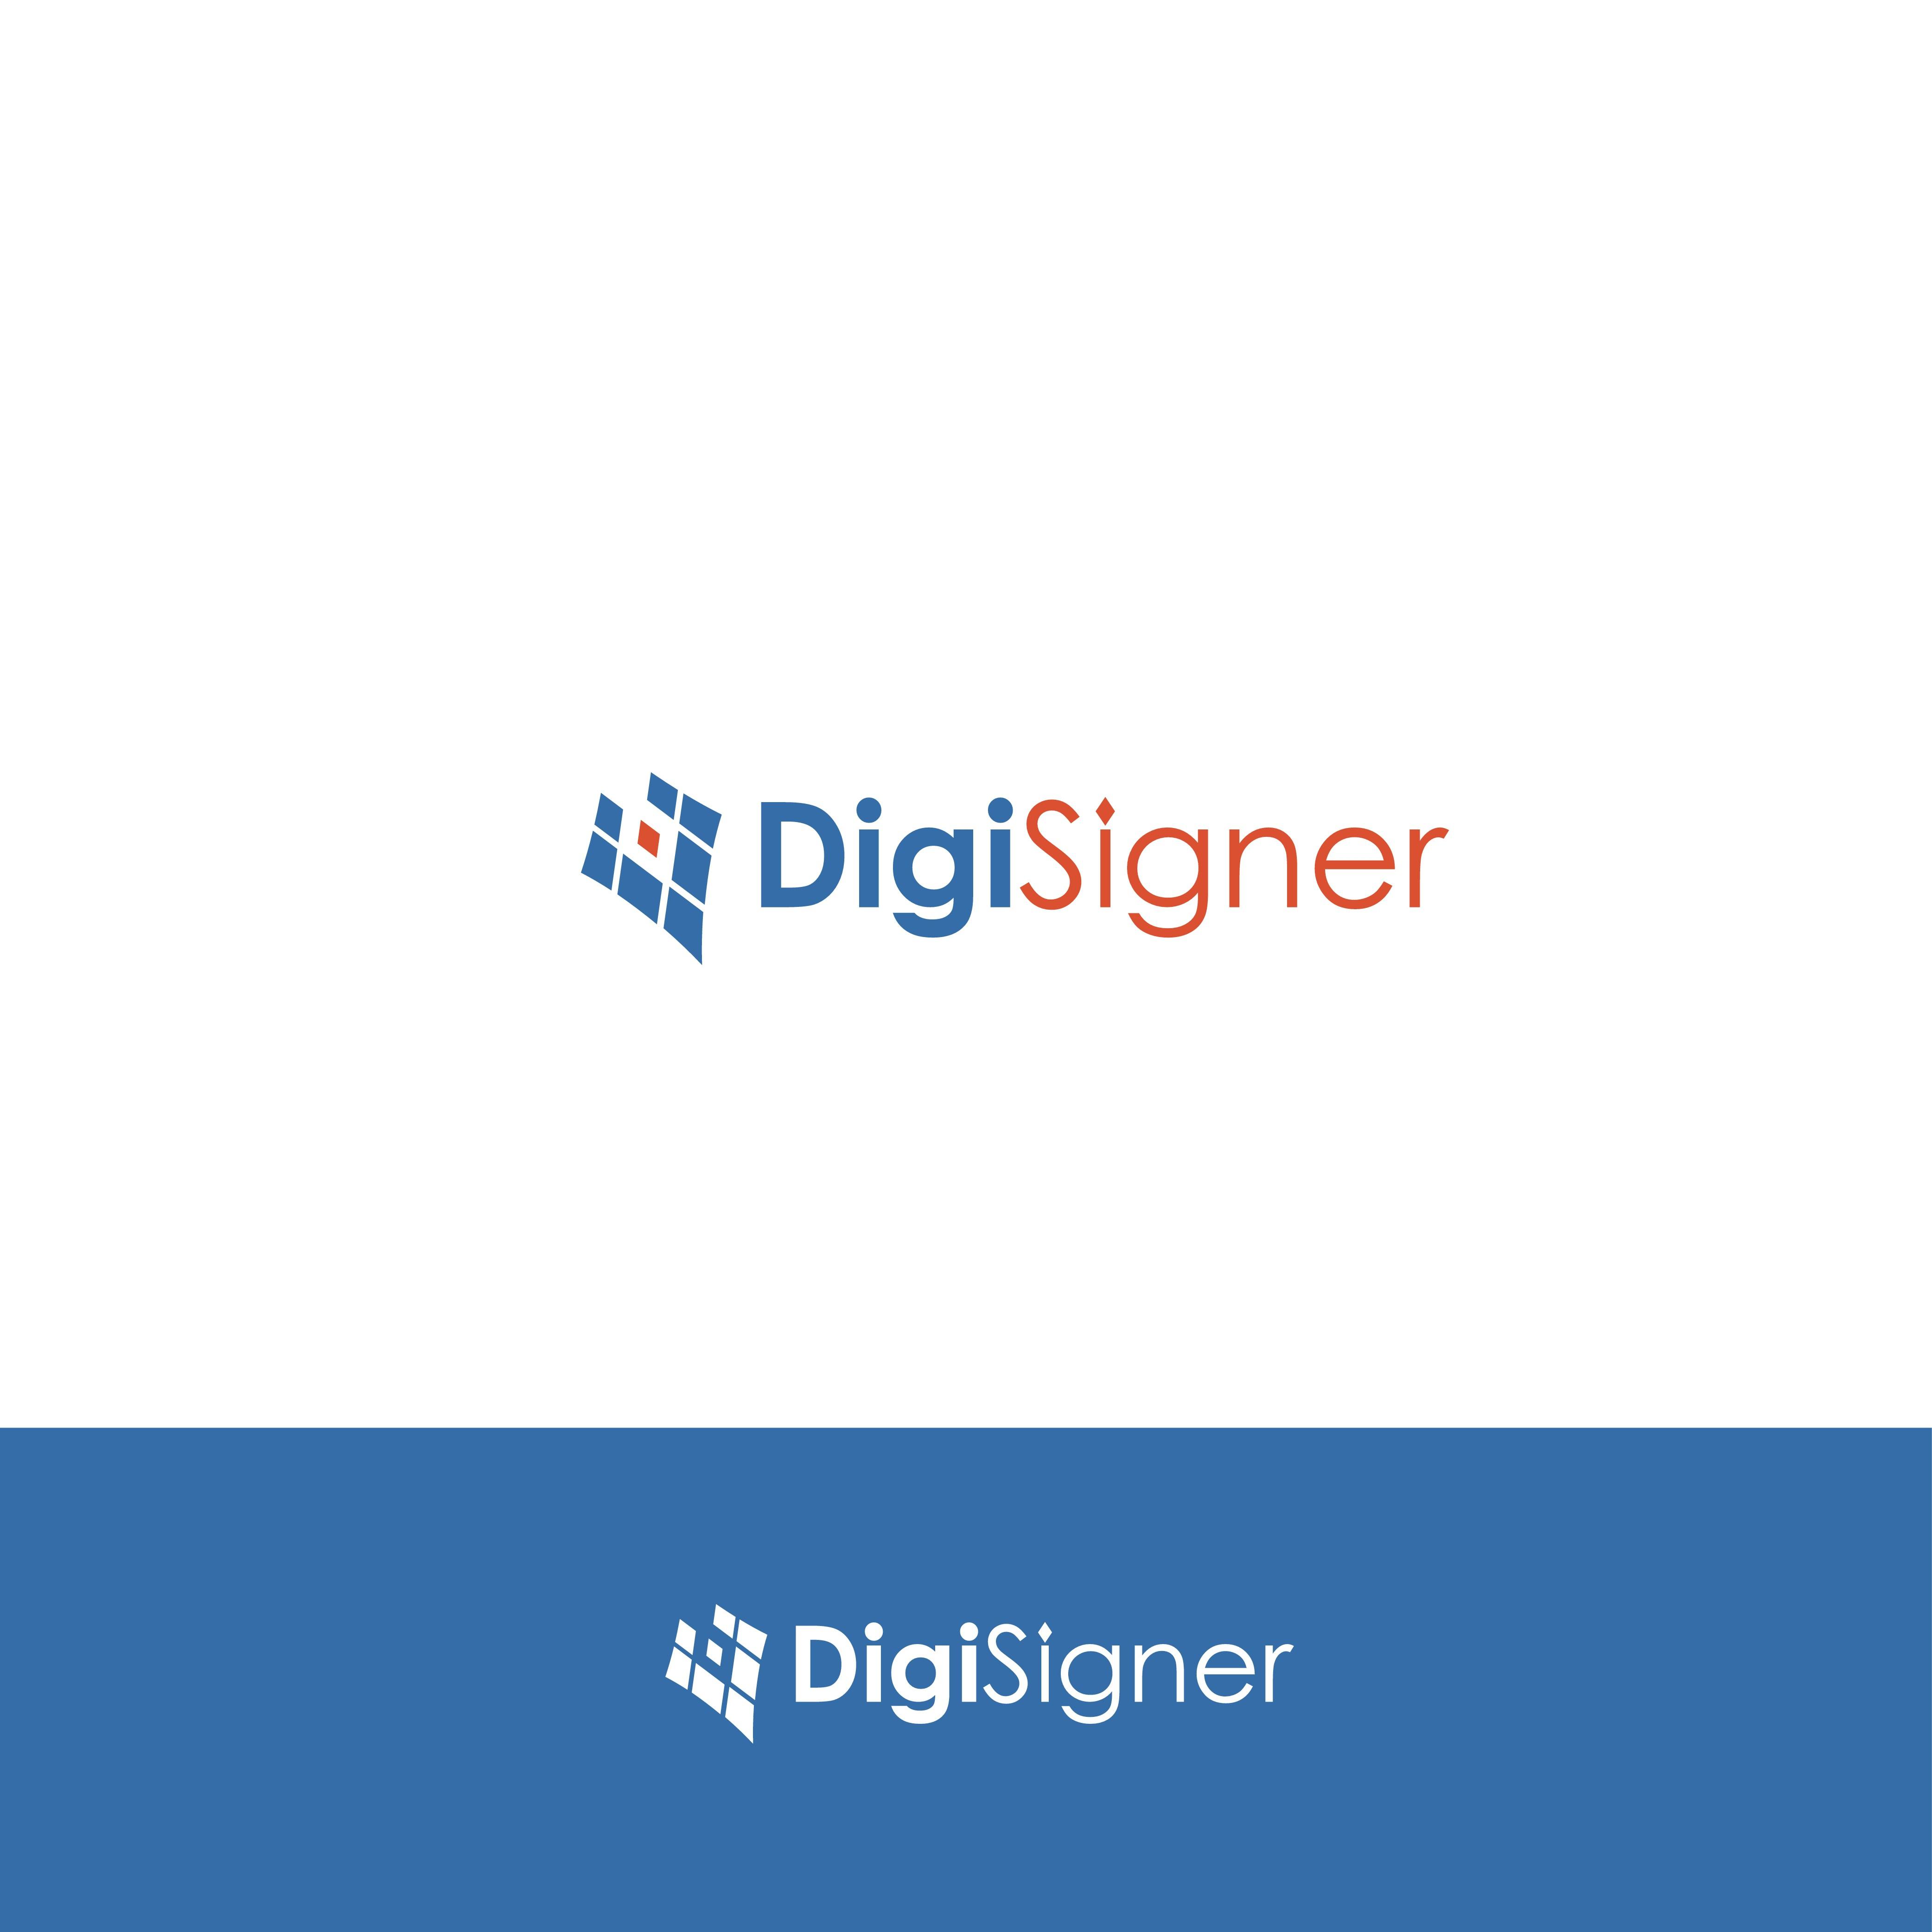 Logo for e-signature company